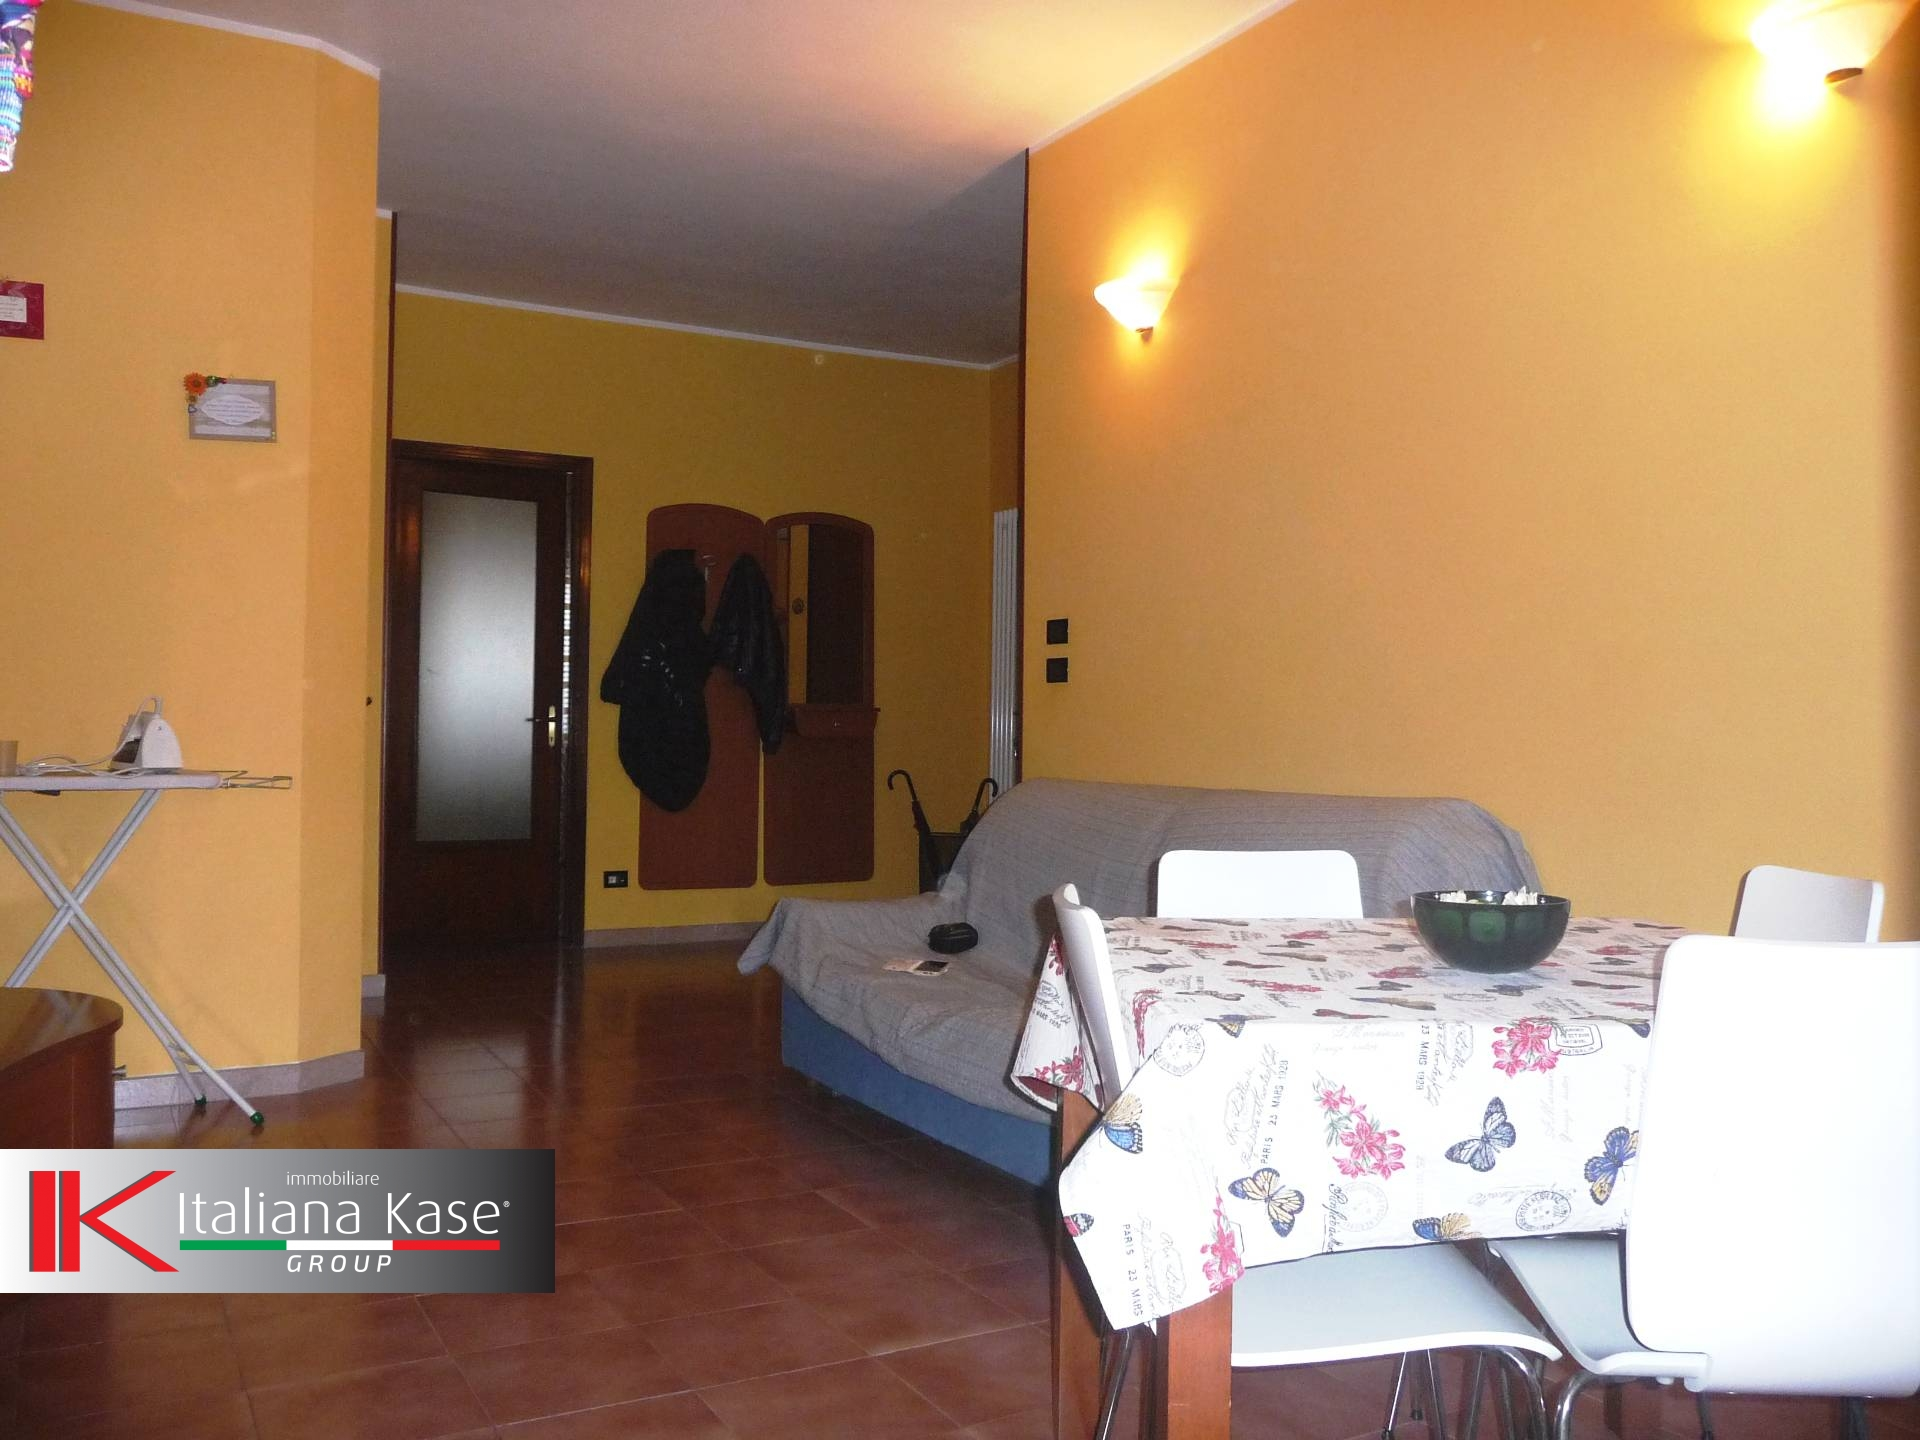 Bilocale Settimo Torinese Via Varese 5